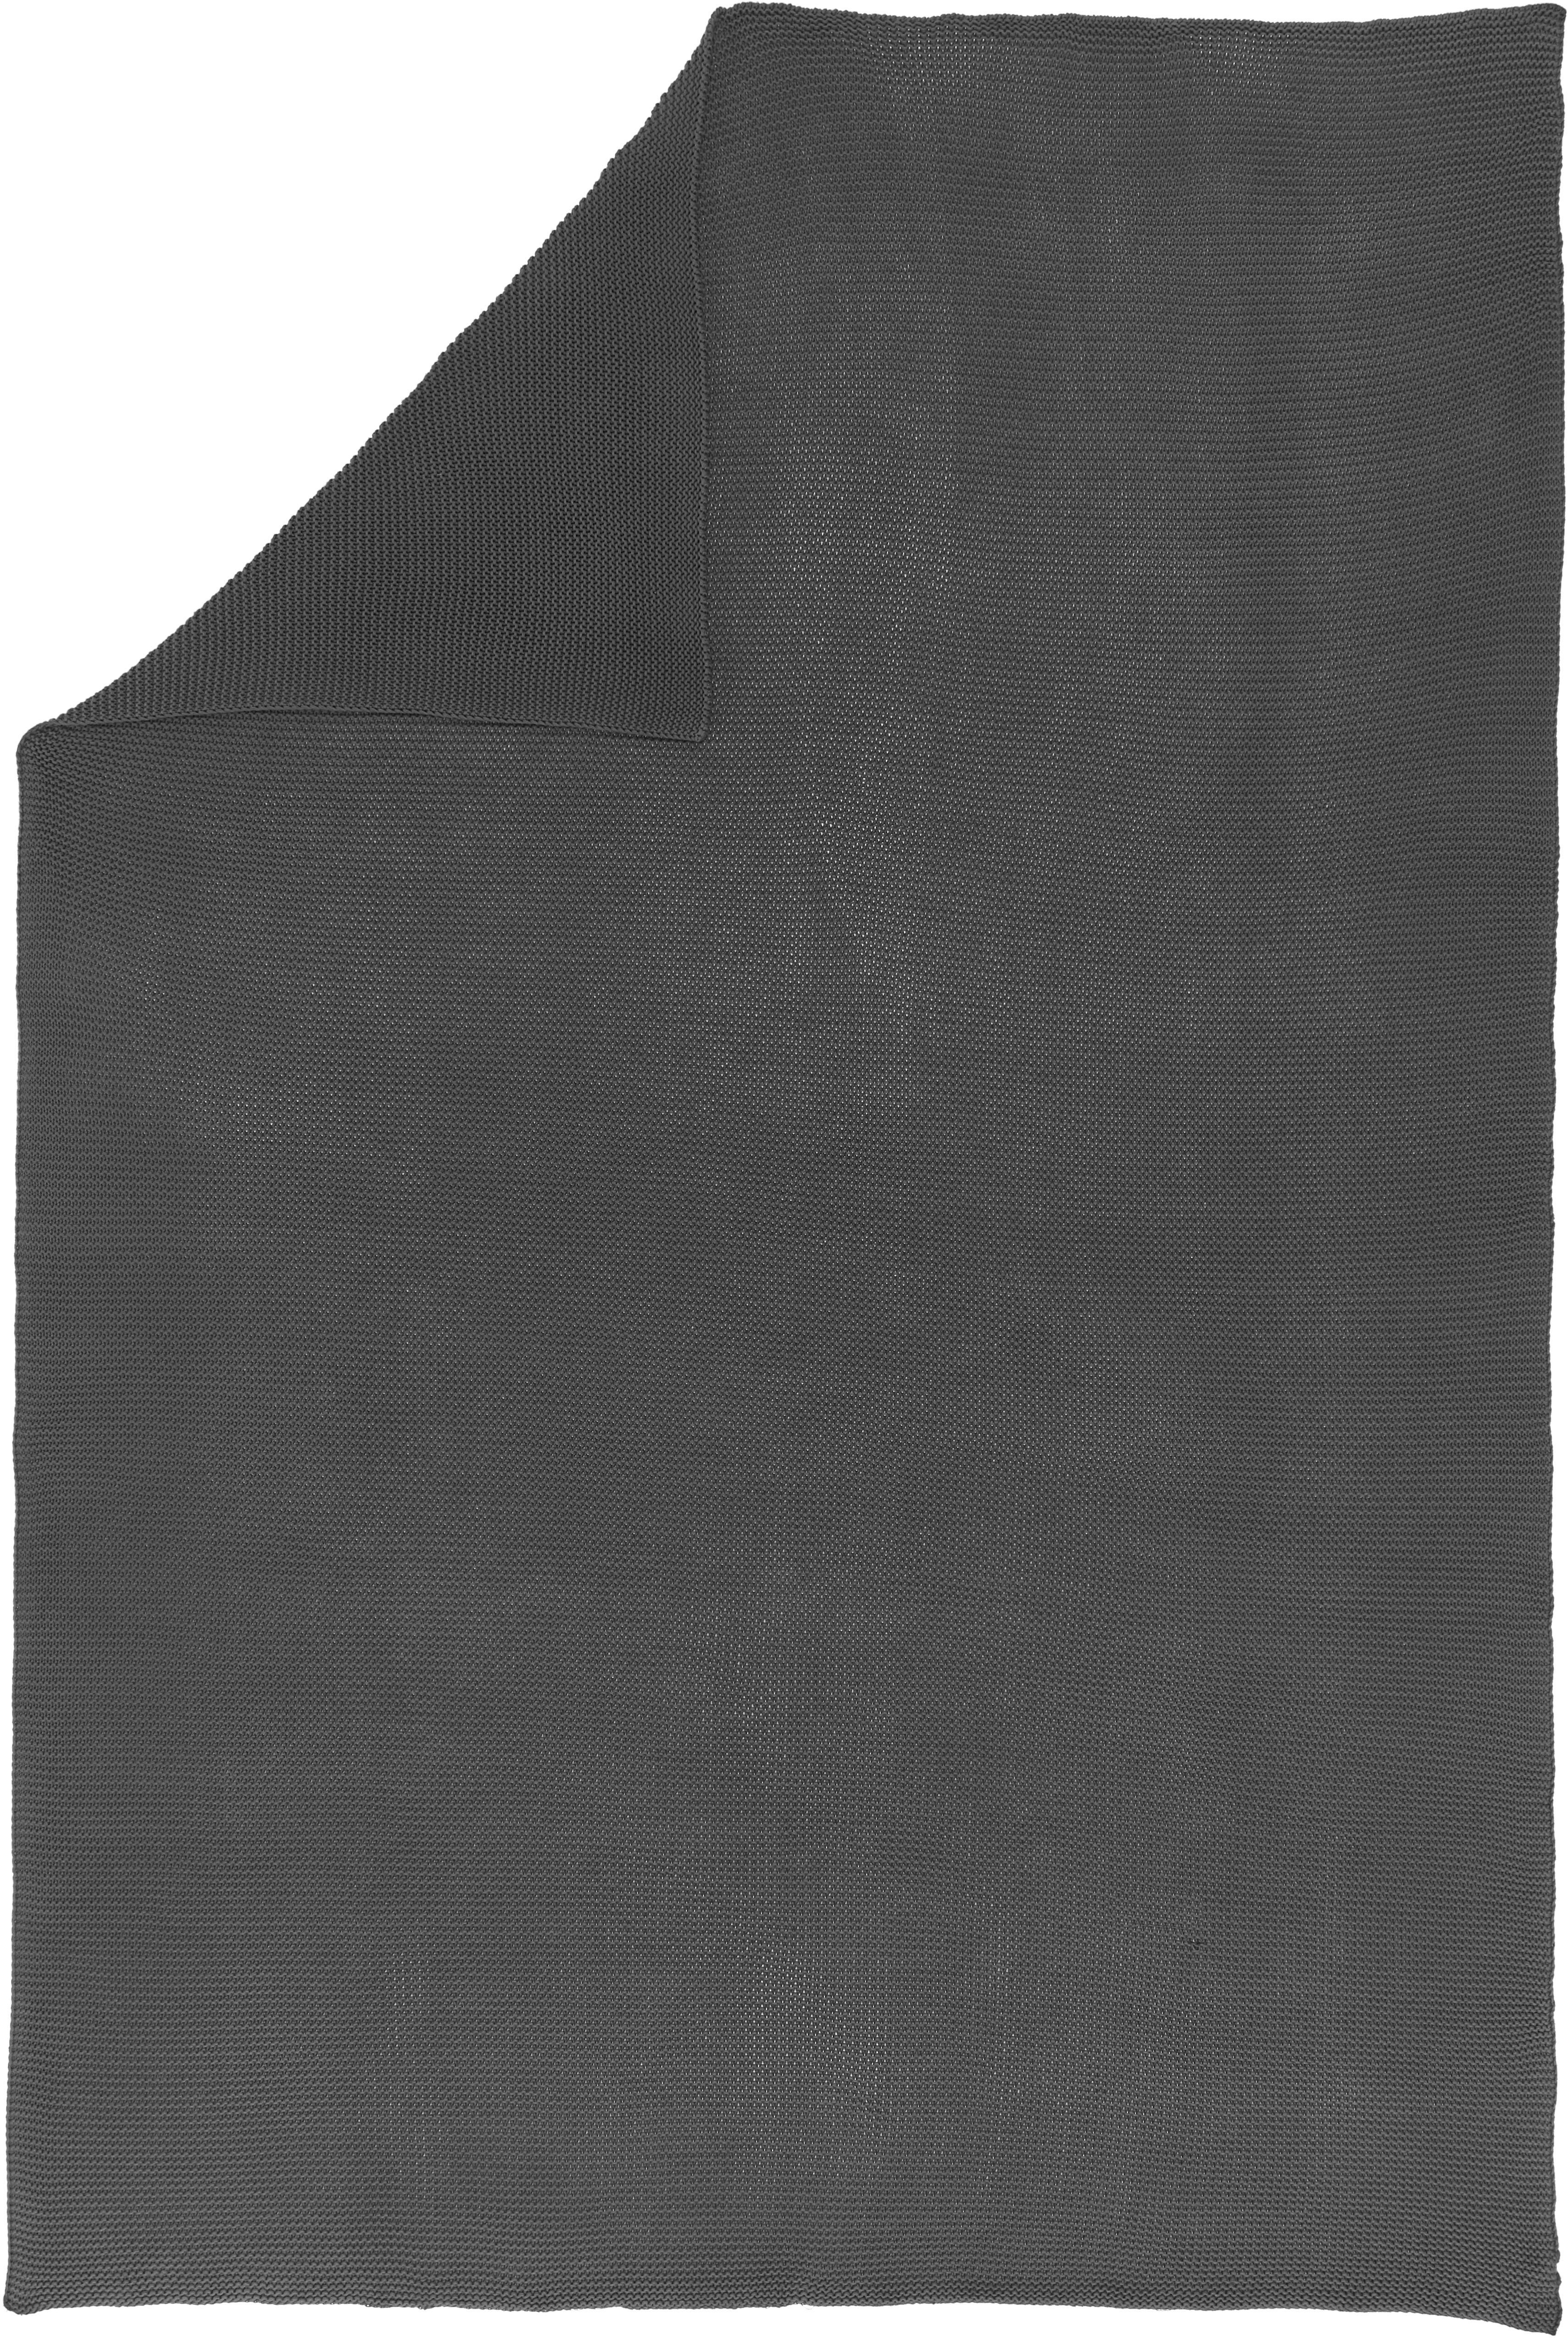 Strick-Plaid Adalyn in Dunkelgrau, 100% Baumwolle, Dunkelgrau, 150 x 200 cm